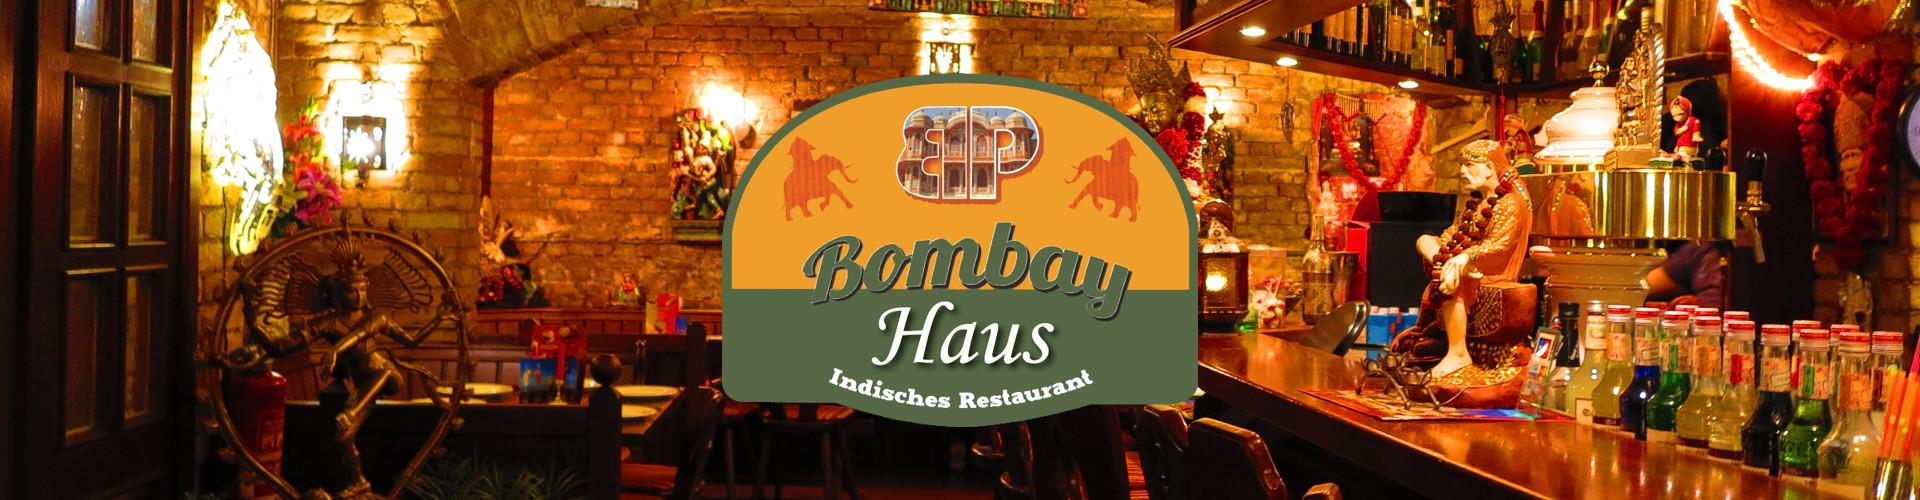 bombay haus rostock indisches spezialit ten restaurant. Black Bedroom Furniture Sets. Home Design Ideas